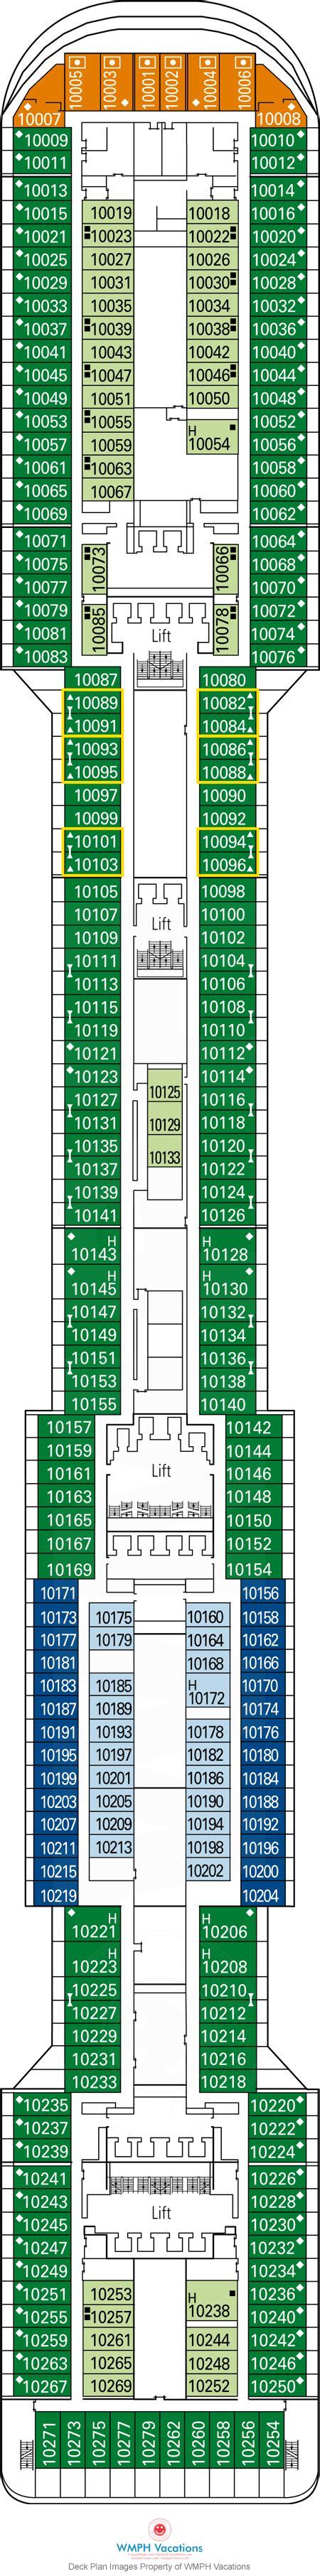 msc divina floor plan msc divina deck plans deck 10 what s on deck 10 on msc